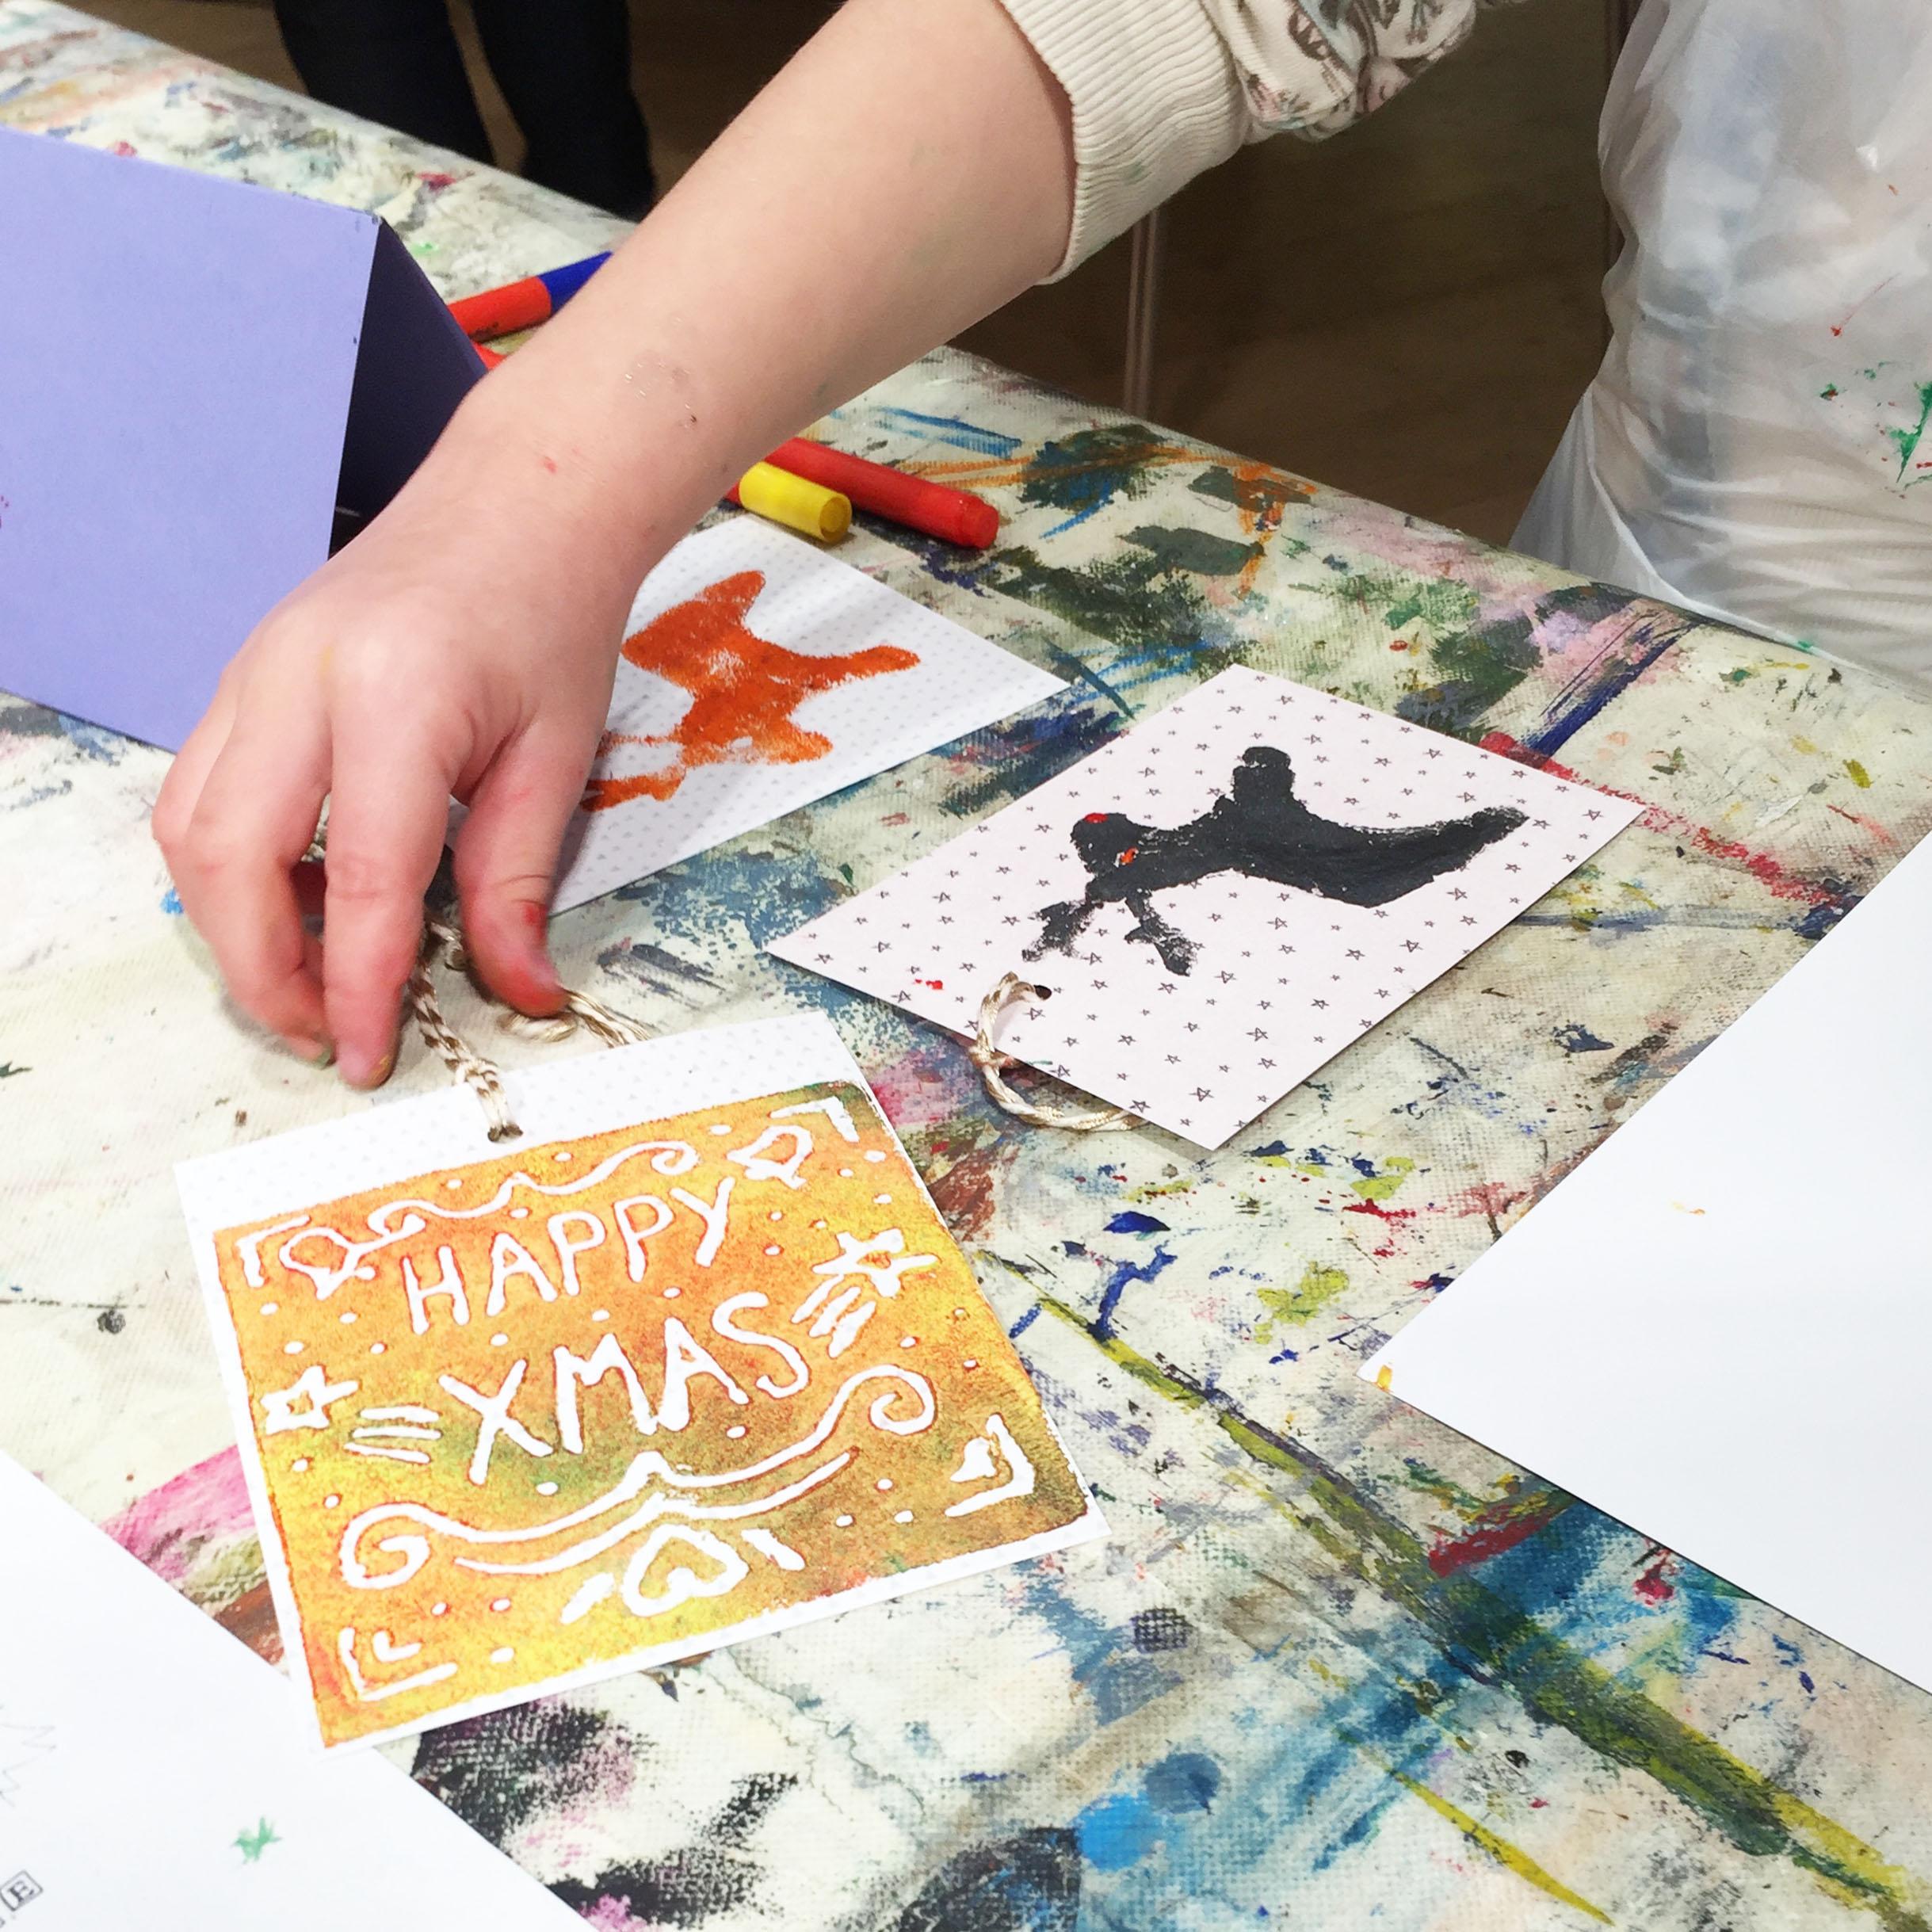 Festive Printmaking